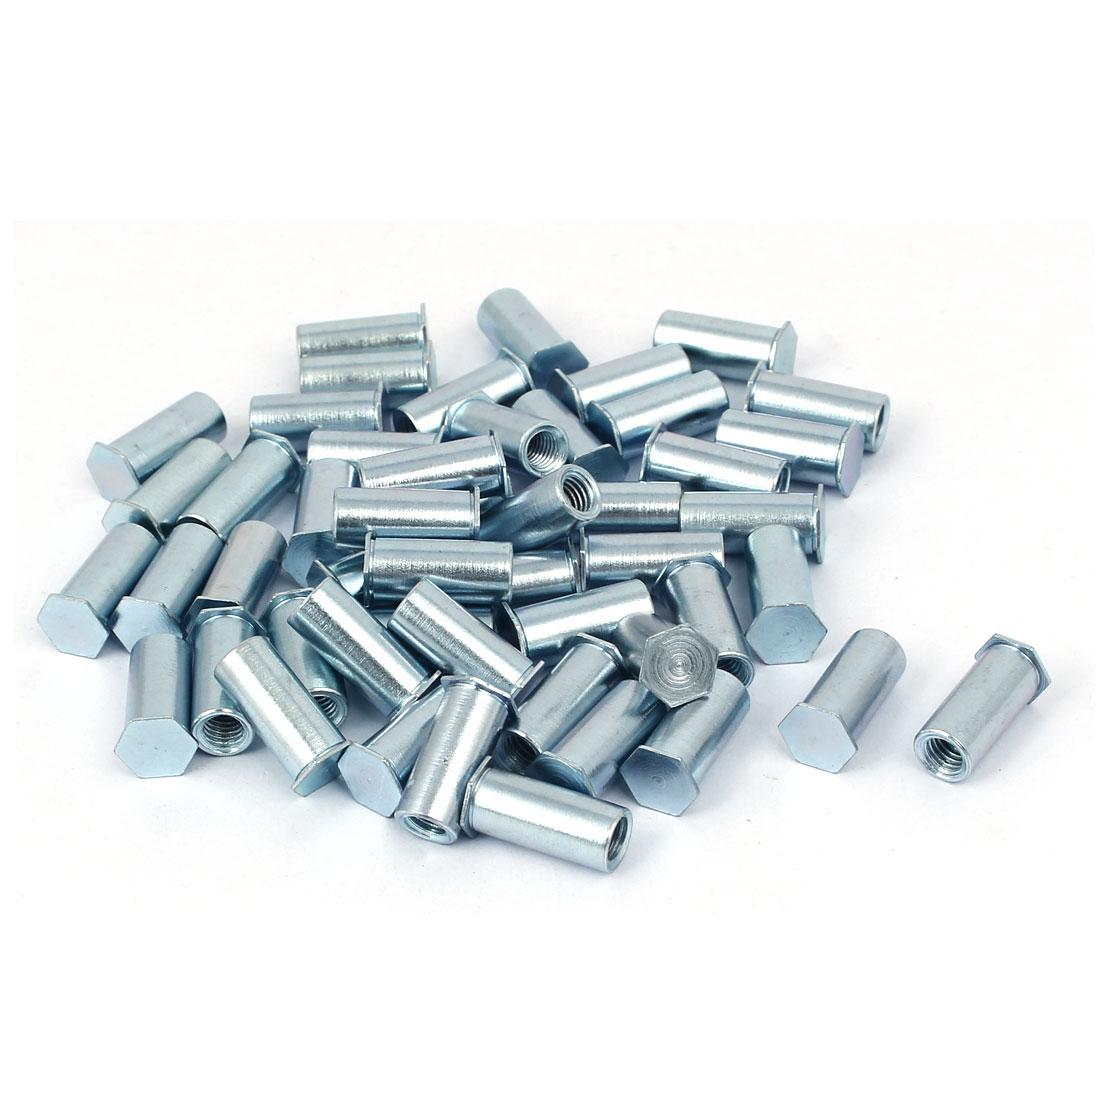 M5 x 16mm Thread Galvanized Carbon Steel Blind Self Clinching Standoffs 50 Pcs